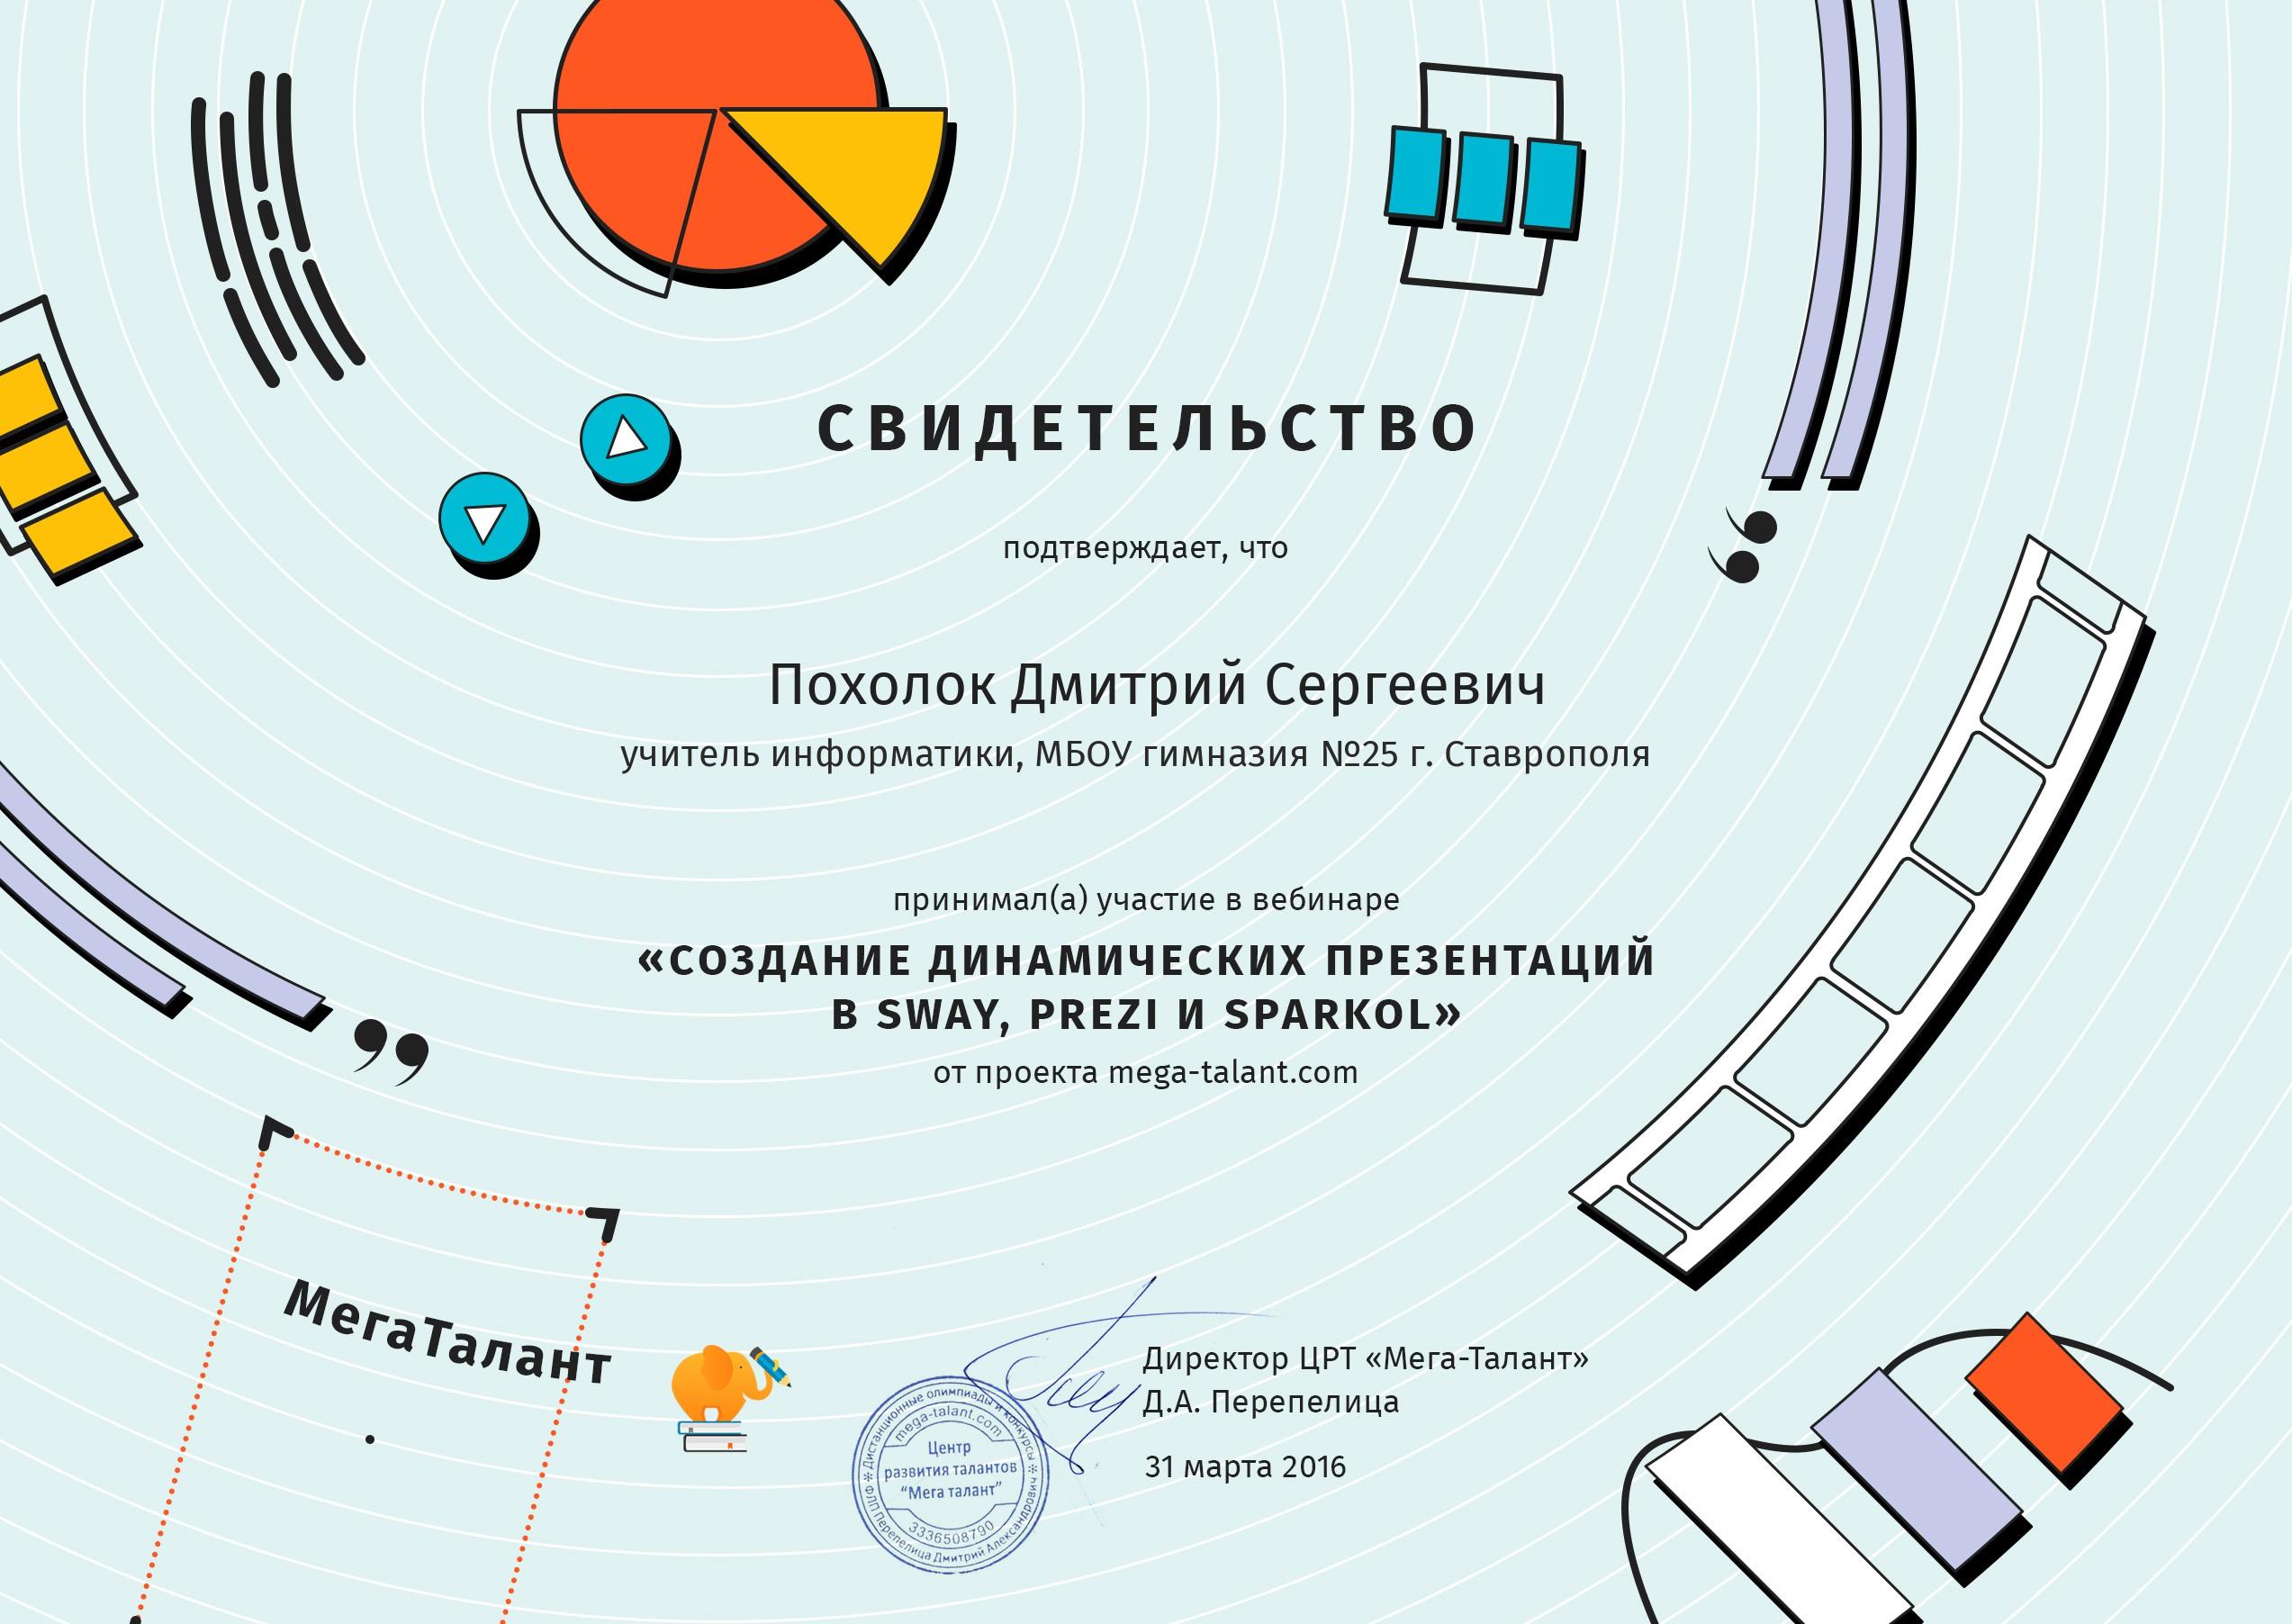 webinar_poholok-dmitriy-sergeevich